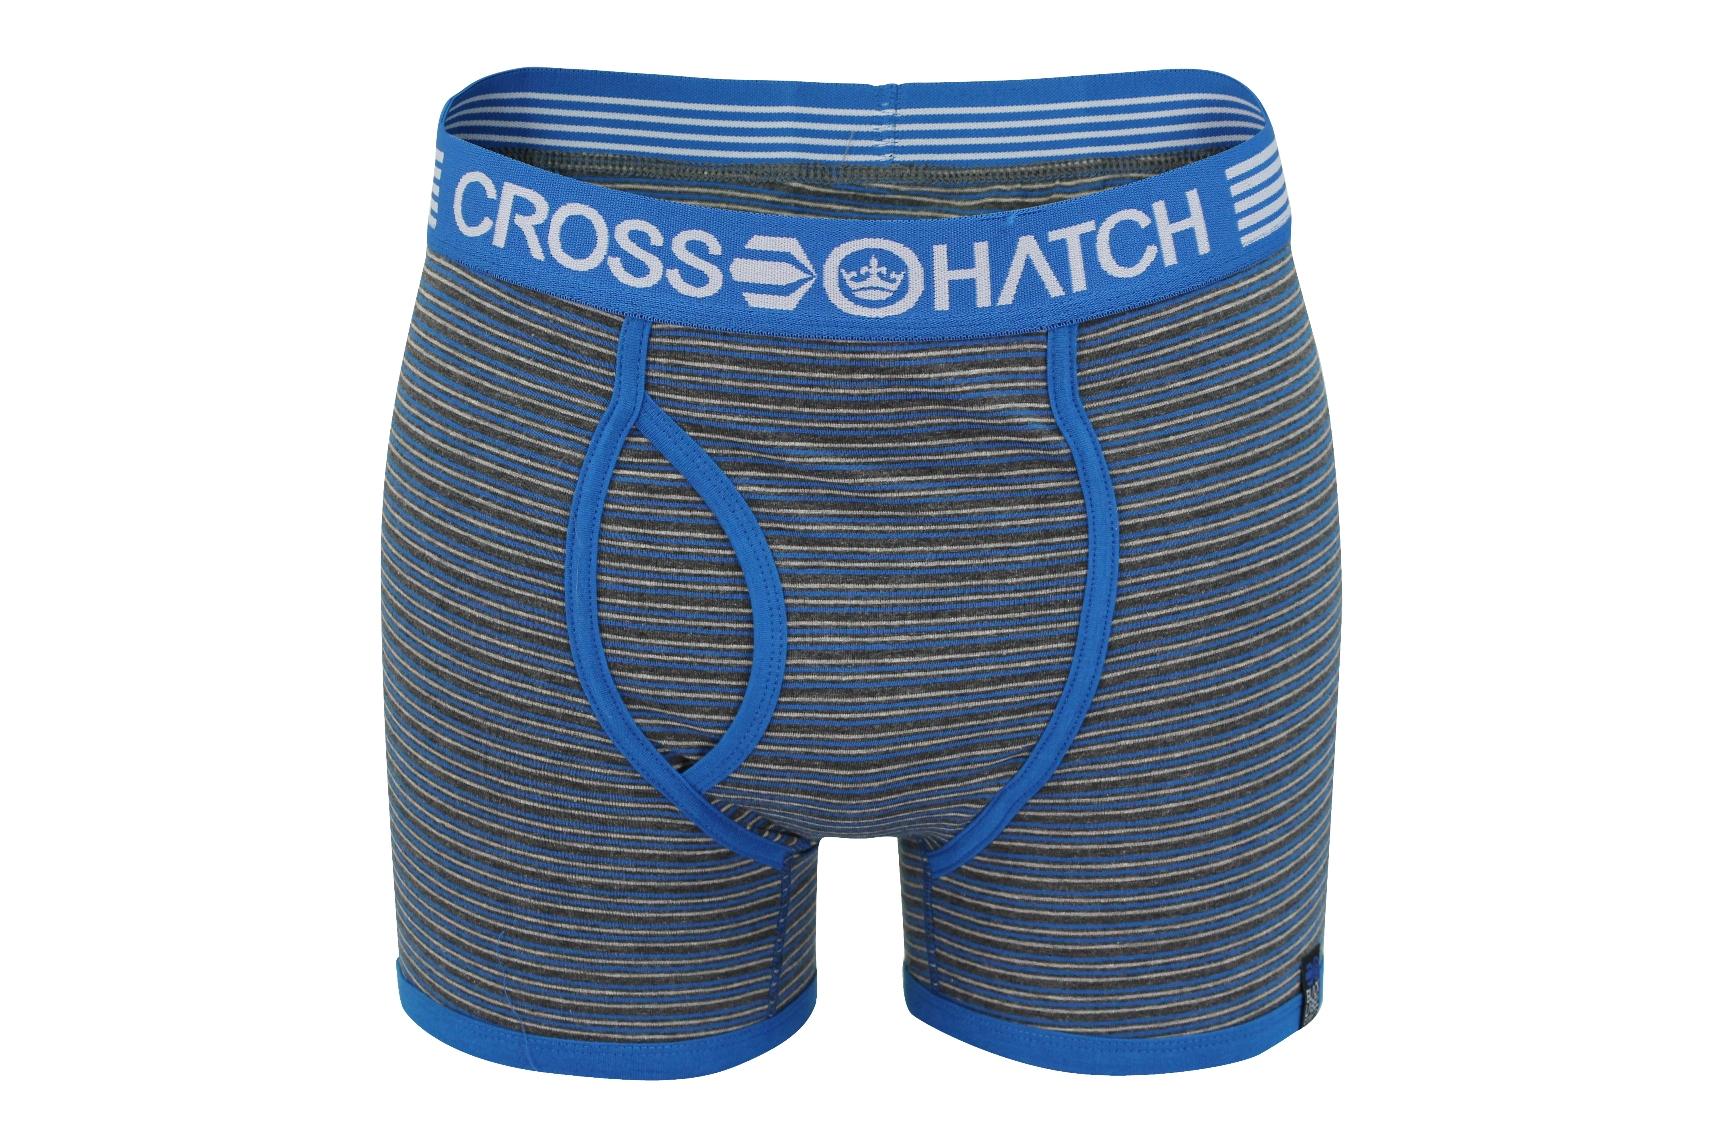 Mens Boxer Shorts Crosshatch Fireglow Bight Colours Underwear Trunks Stretch